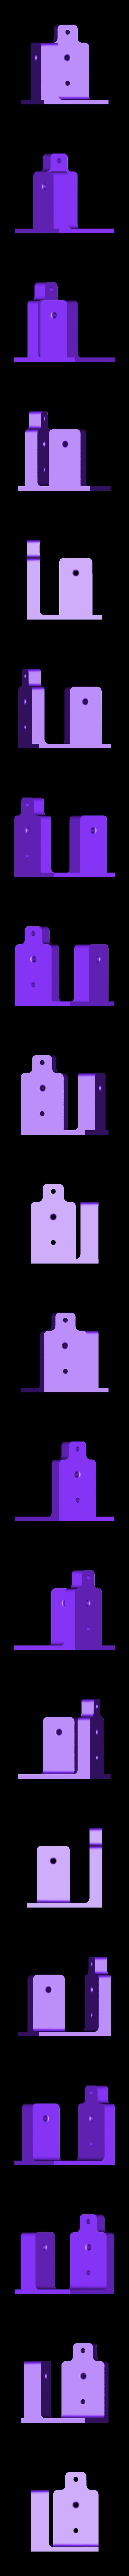 Bevel_gear_base.STL Download free STL file party parrot automata • 3D printable design, melonshu